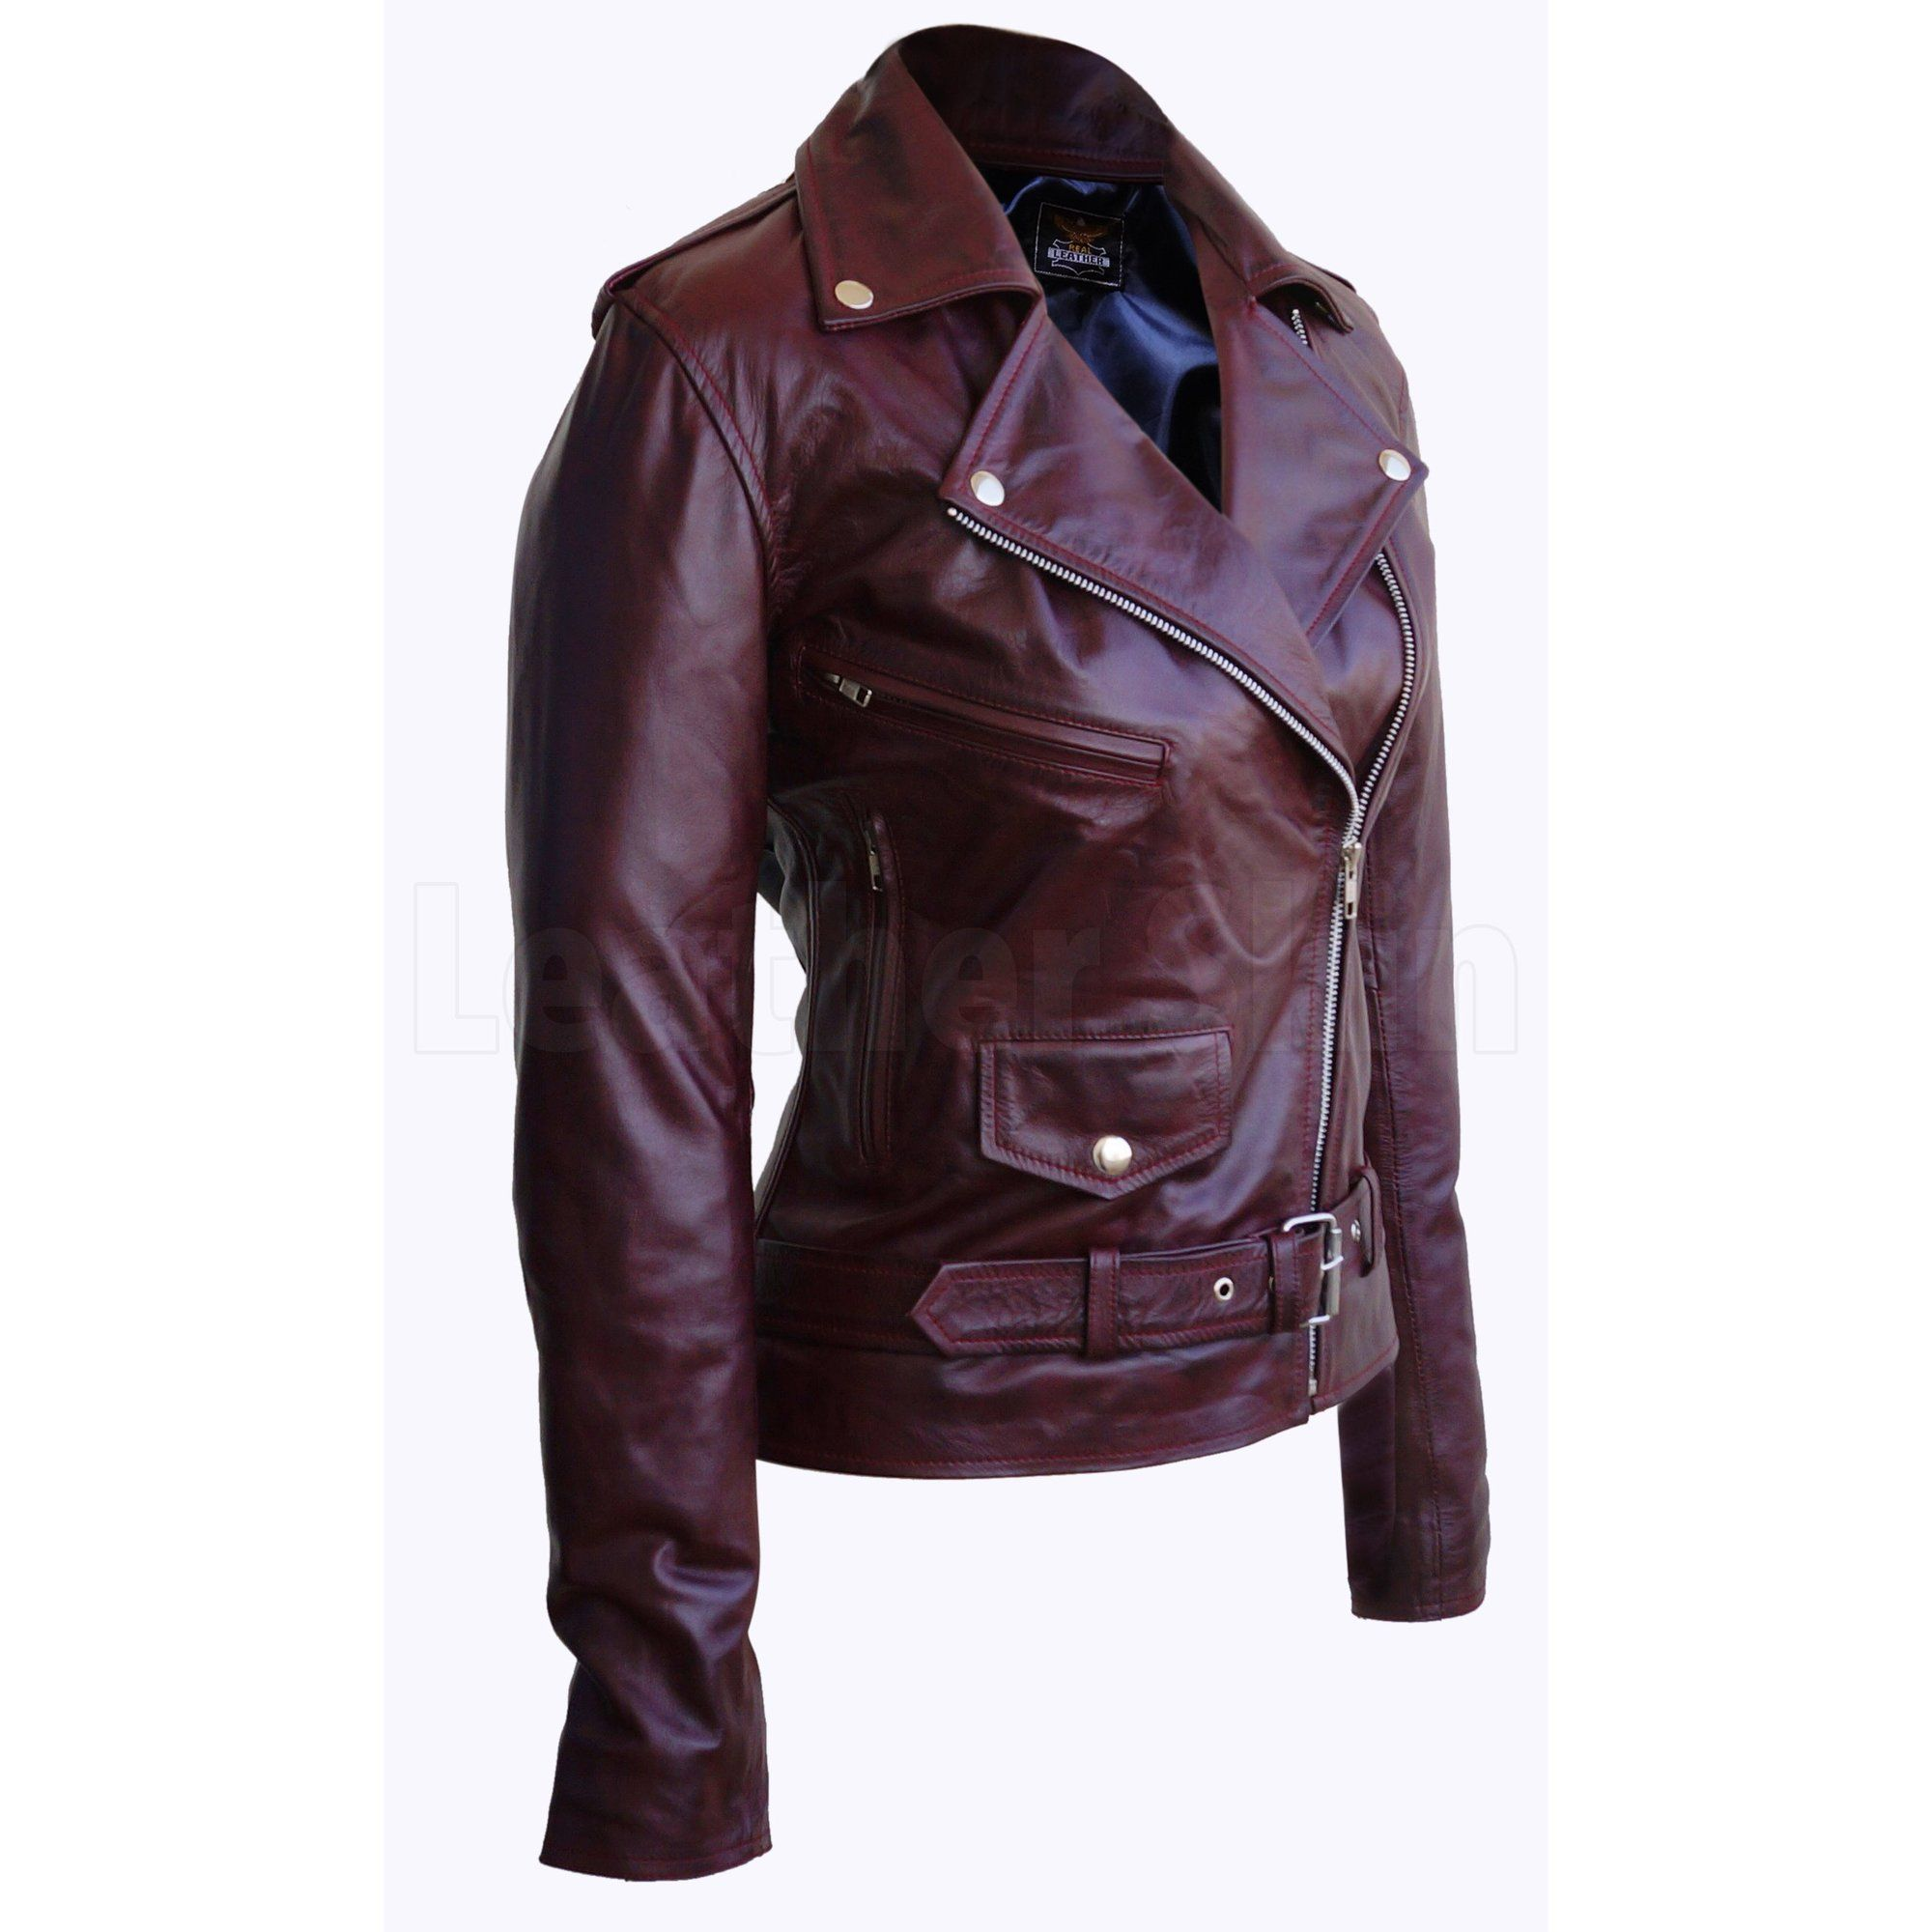 Women Distressed Red Brando Belted Sheep Leather Jacket With Epaulettes Leather Jacket Leather Jackets Women Leather Blazer Women [ 2000 x 2000 Pixel ]